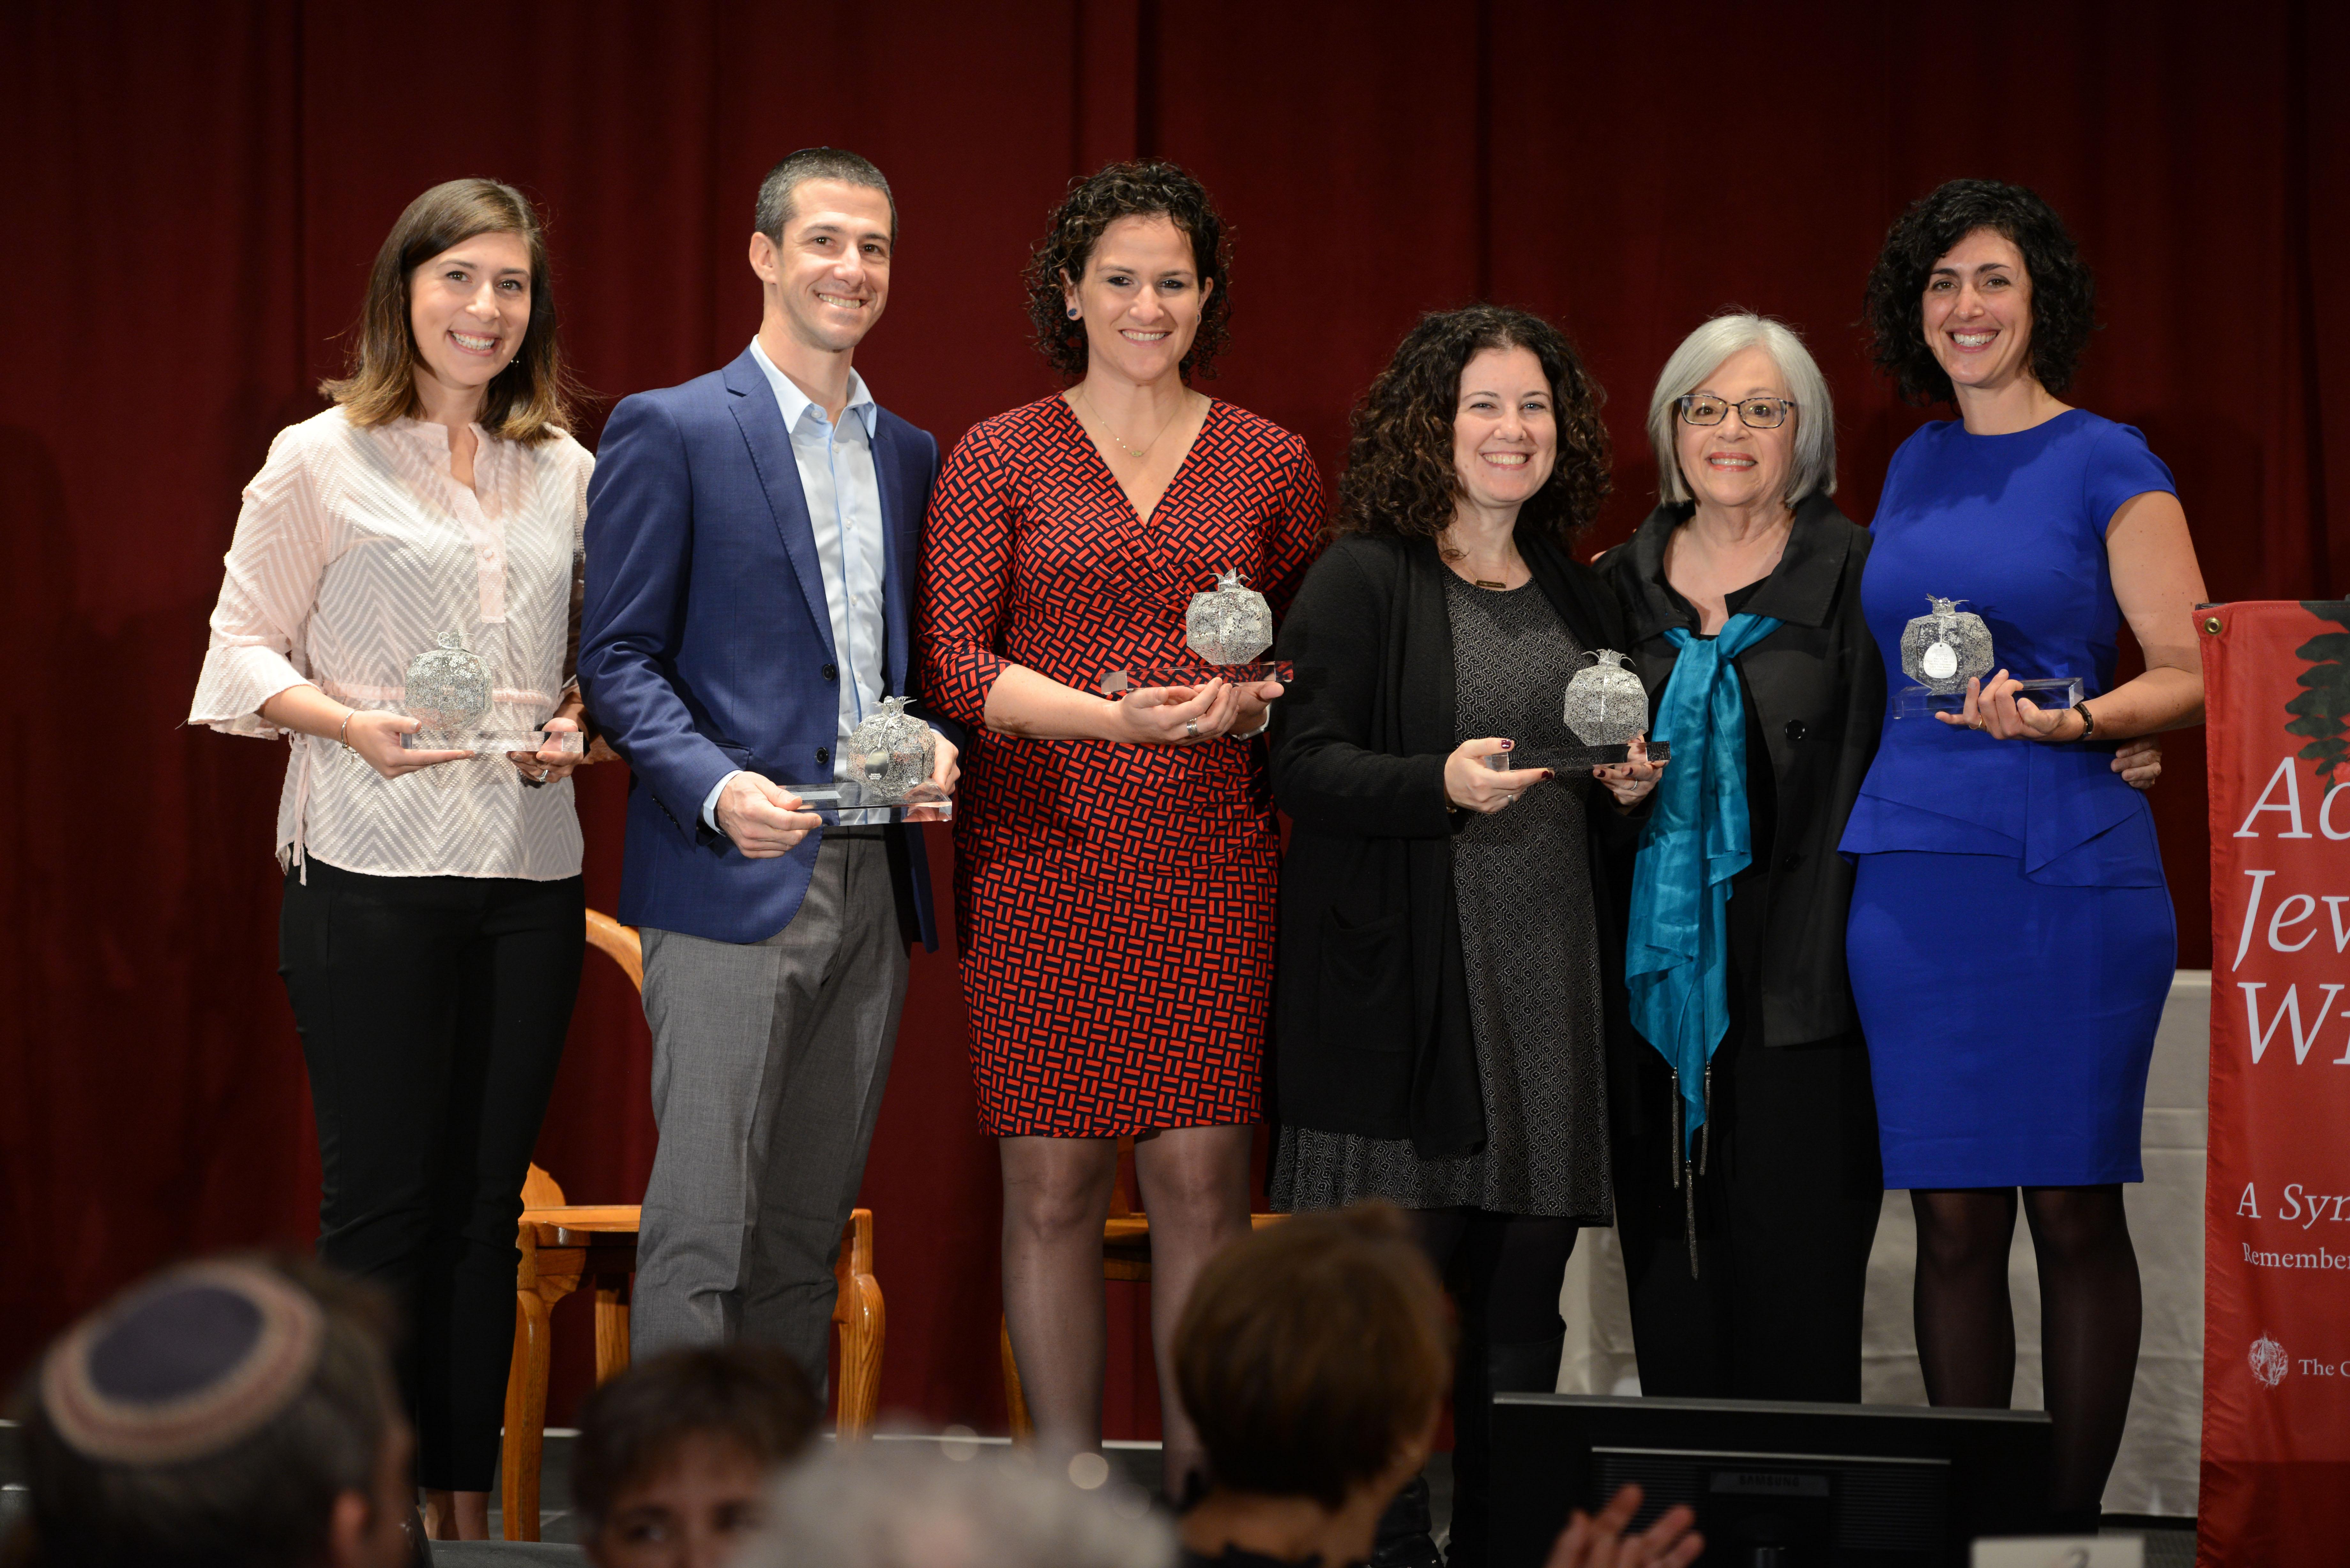 The 2018 Pomegranate Prize Recipients, with Covenant Foundation Board Chair Cheryl Finkel. From left: Hannah Kearney, Oren Kaunfer, Maiya Chard-Yaron, Ilana Gleicher-Bloom, Cheryl Finkel, and Rabbi Adina Allen.